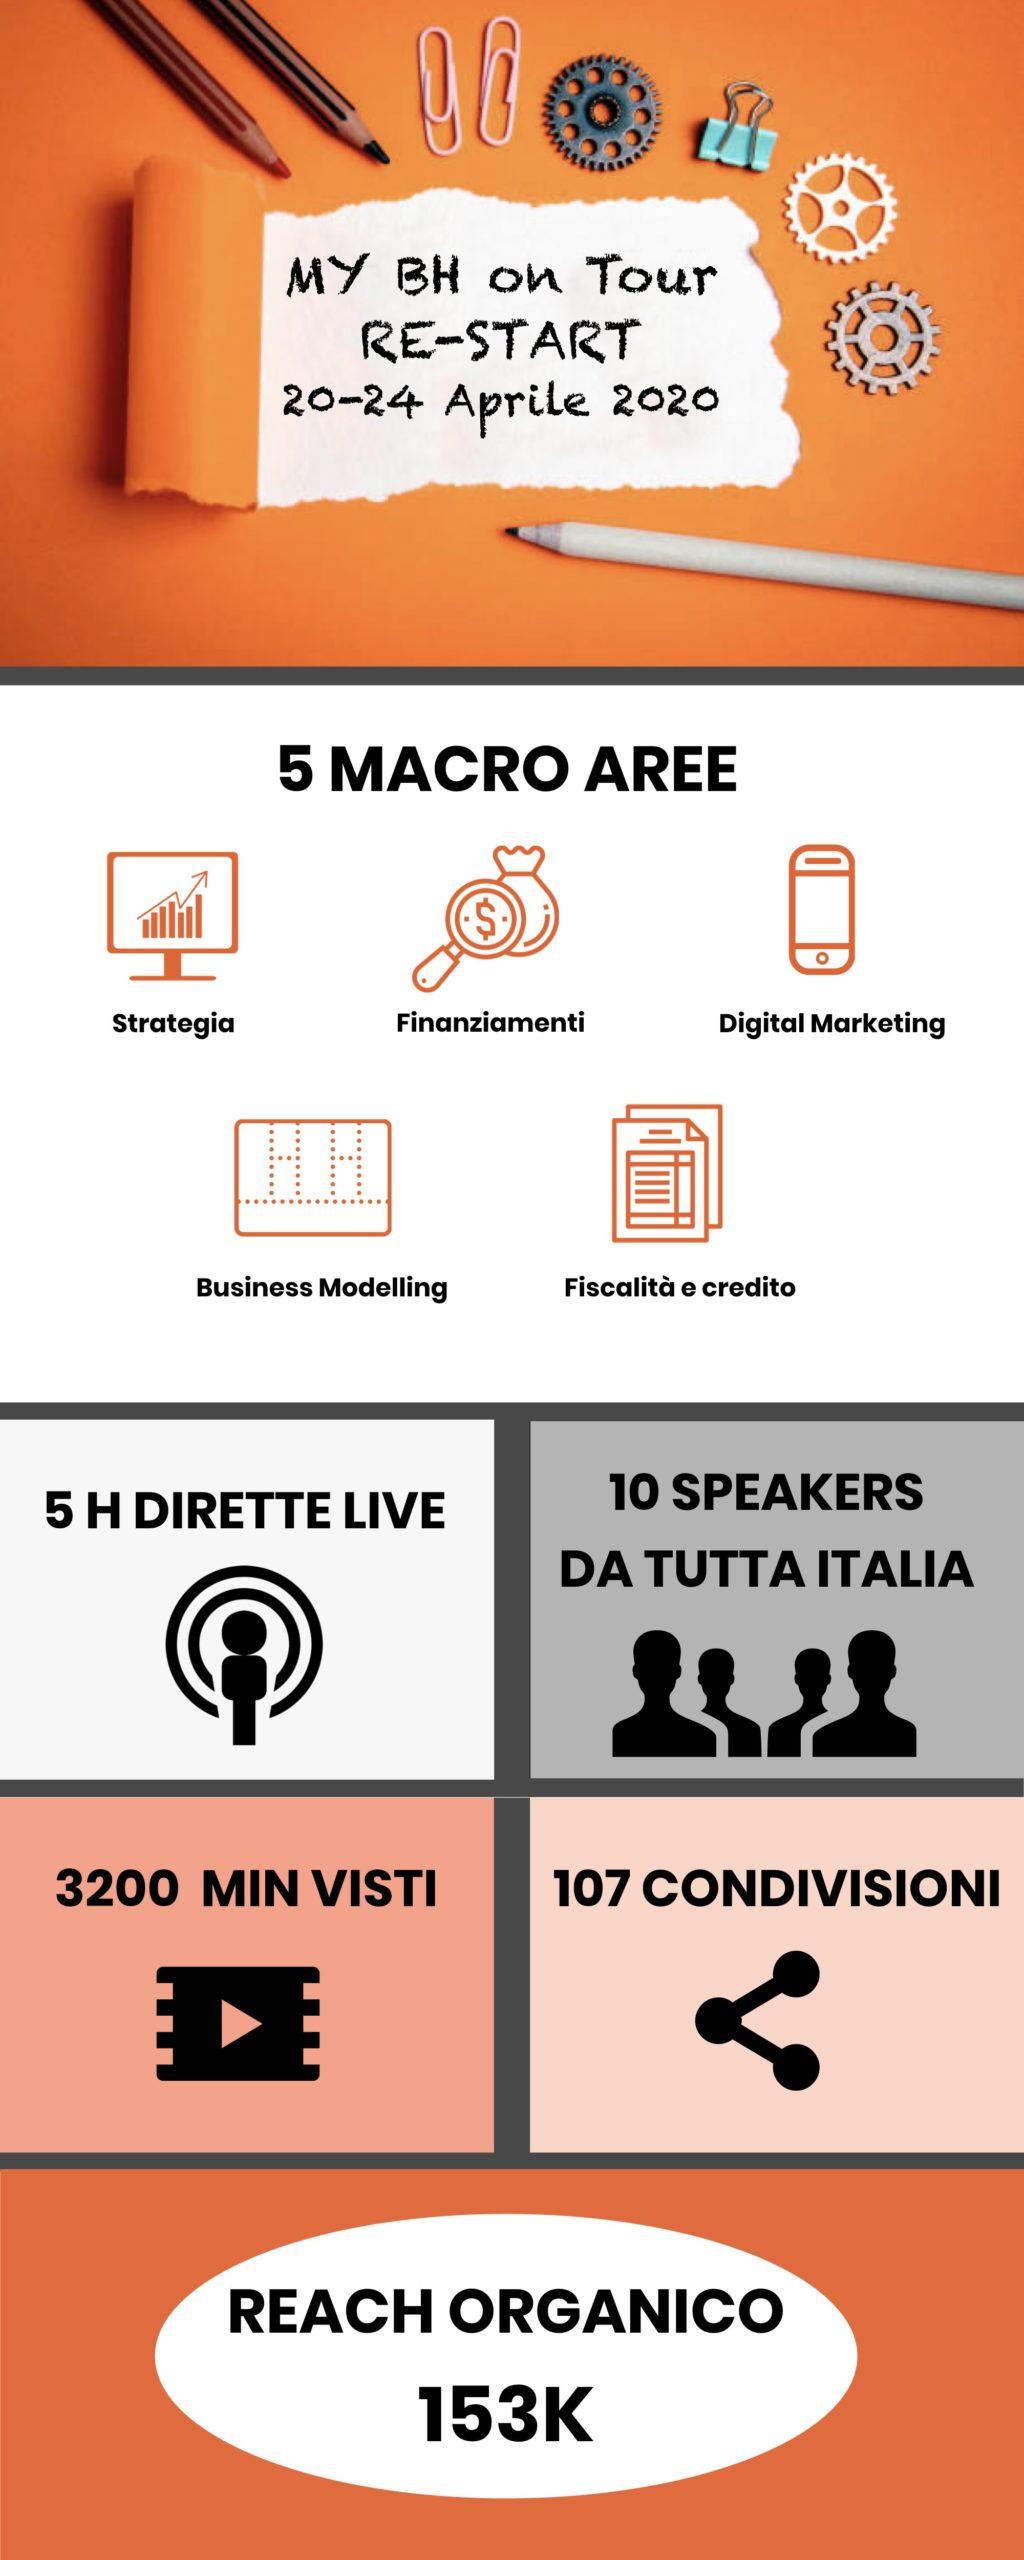 infografica evento digitale re start